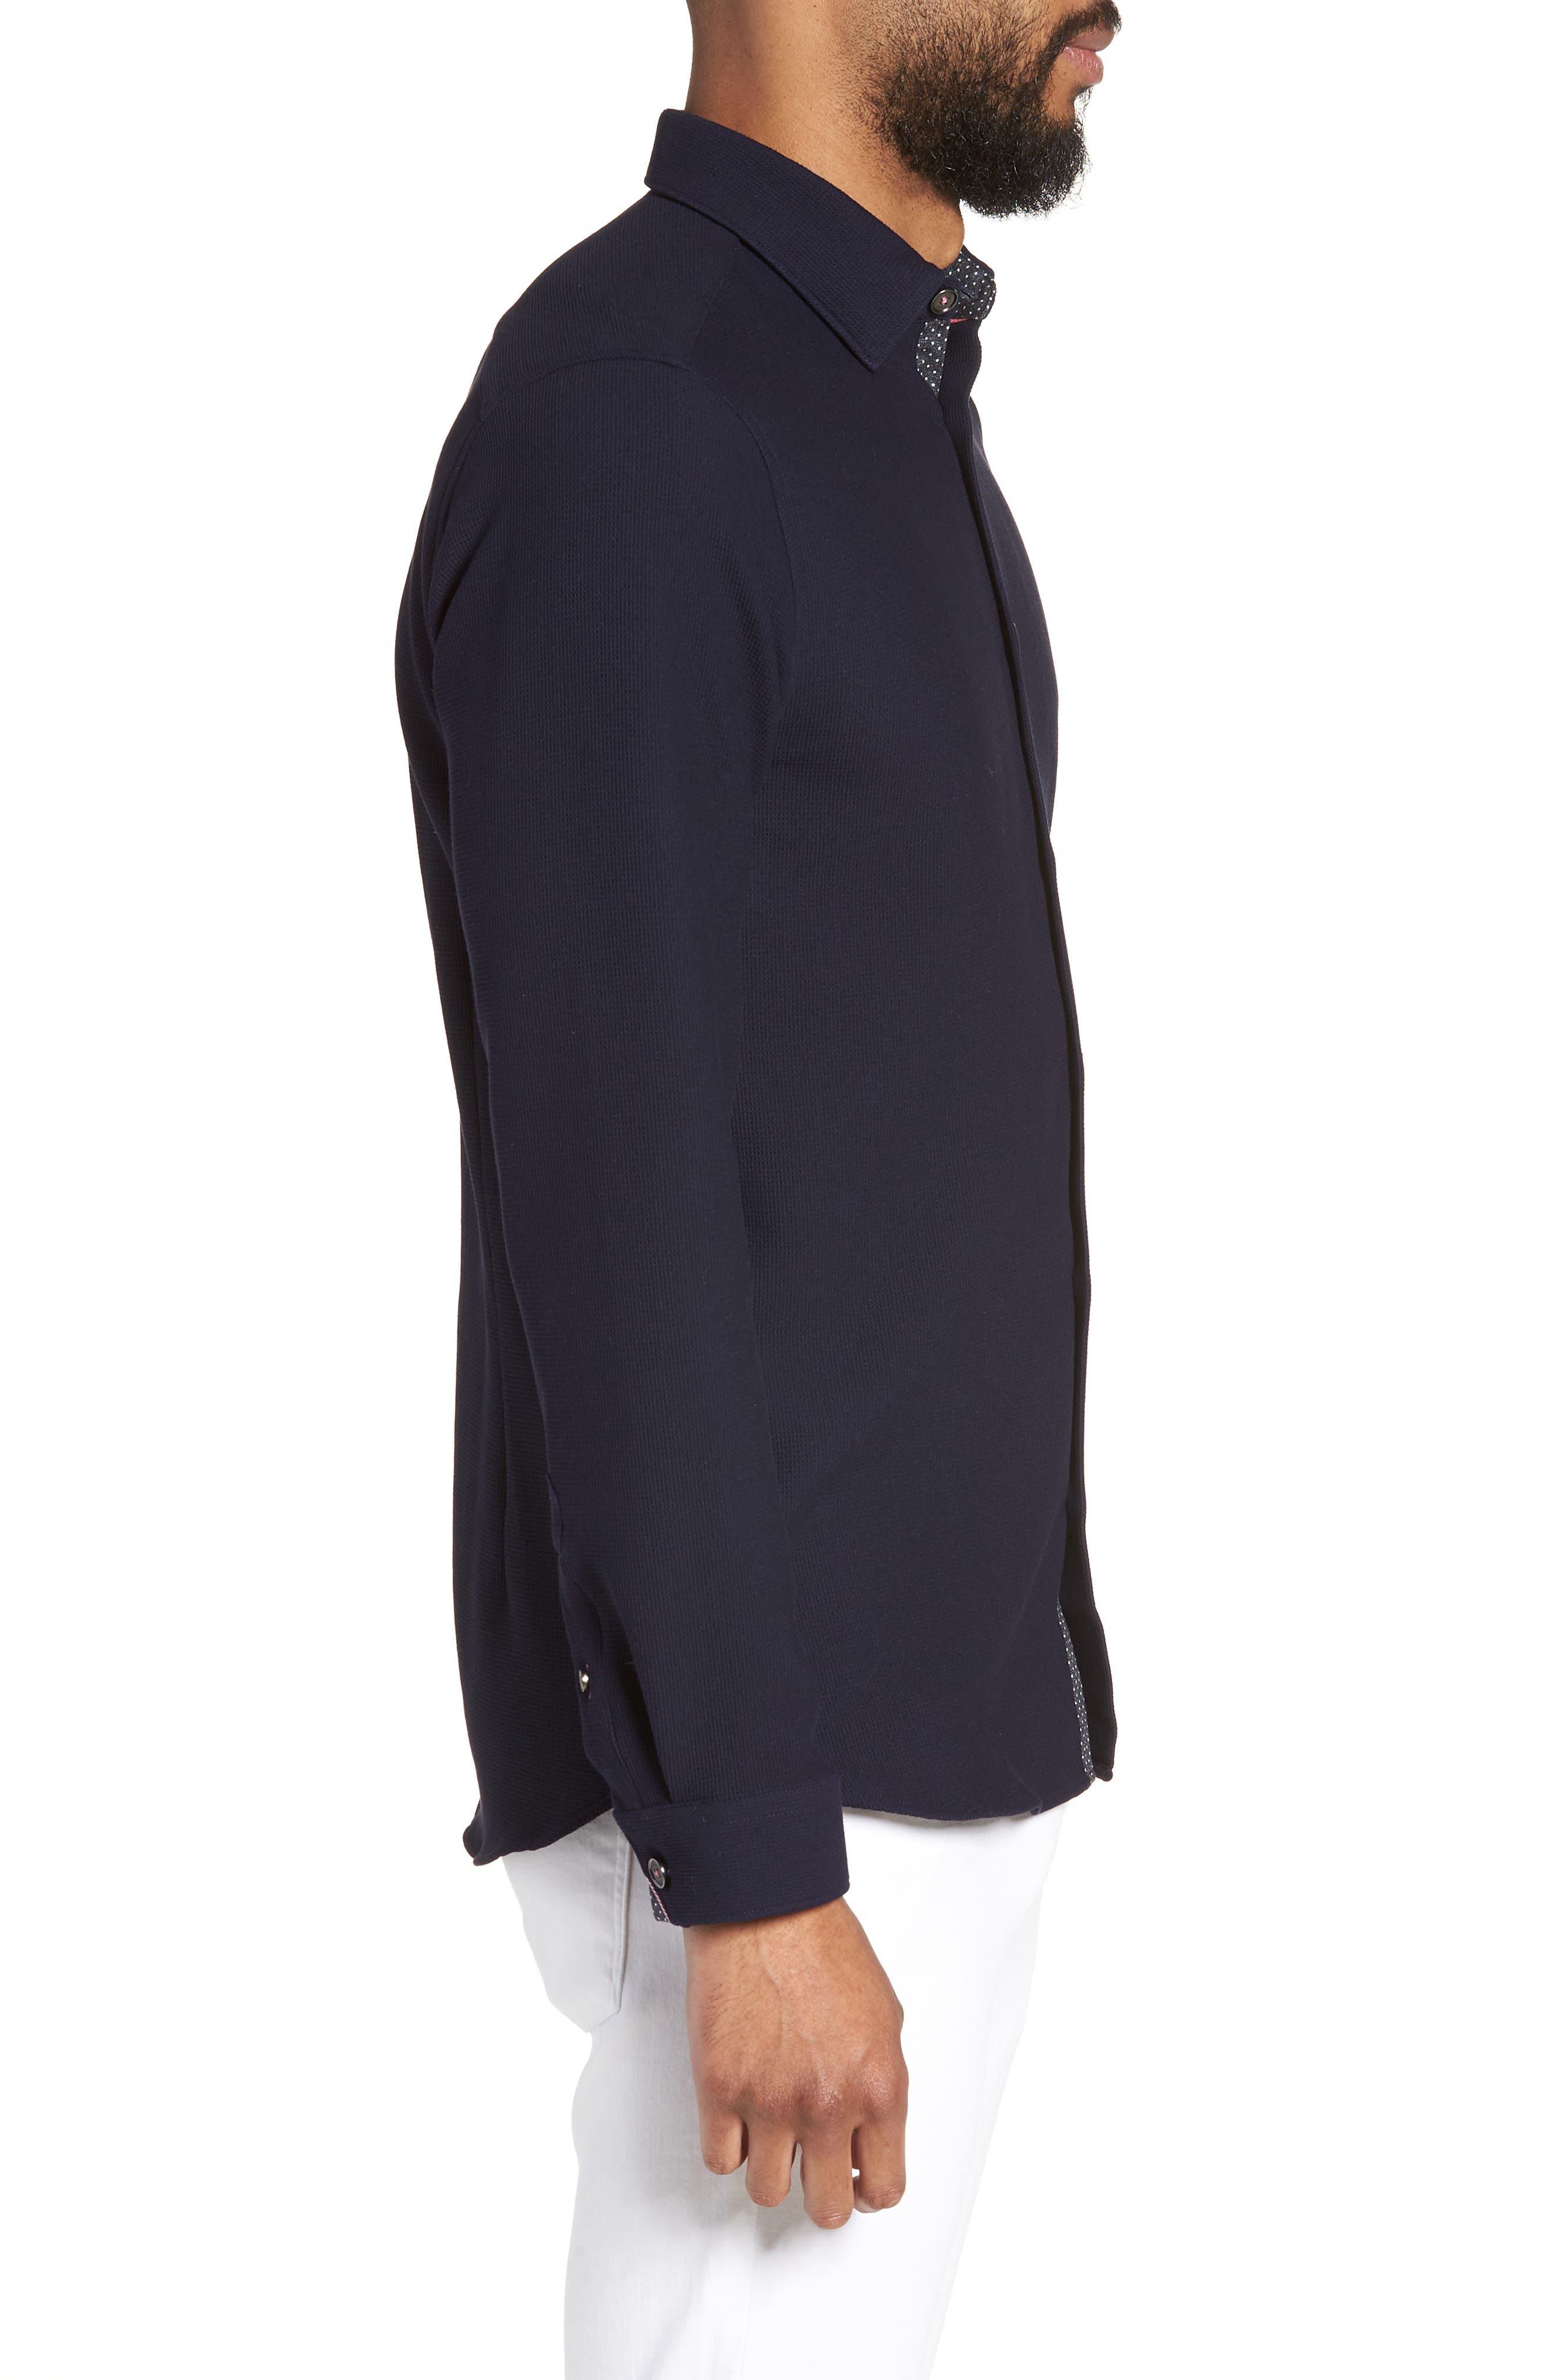 Loretax Trim Fit Stretch Knit Sport Shirt,                             Alternate thumbnail 3, color,